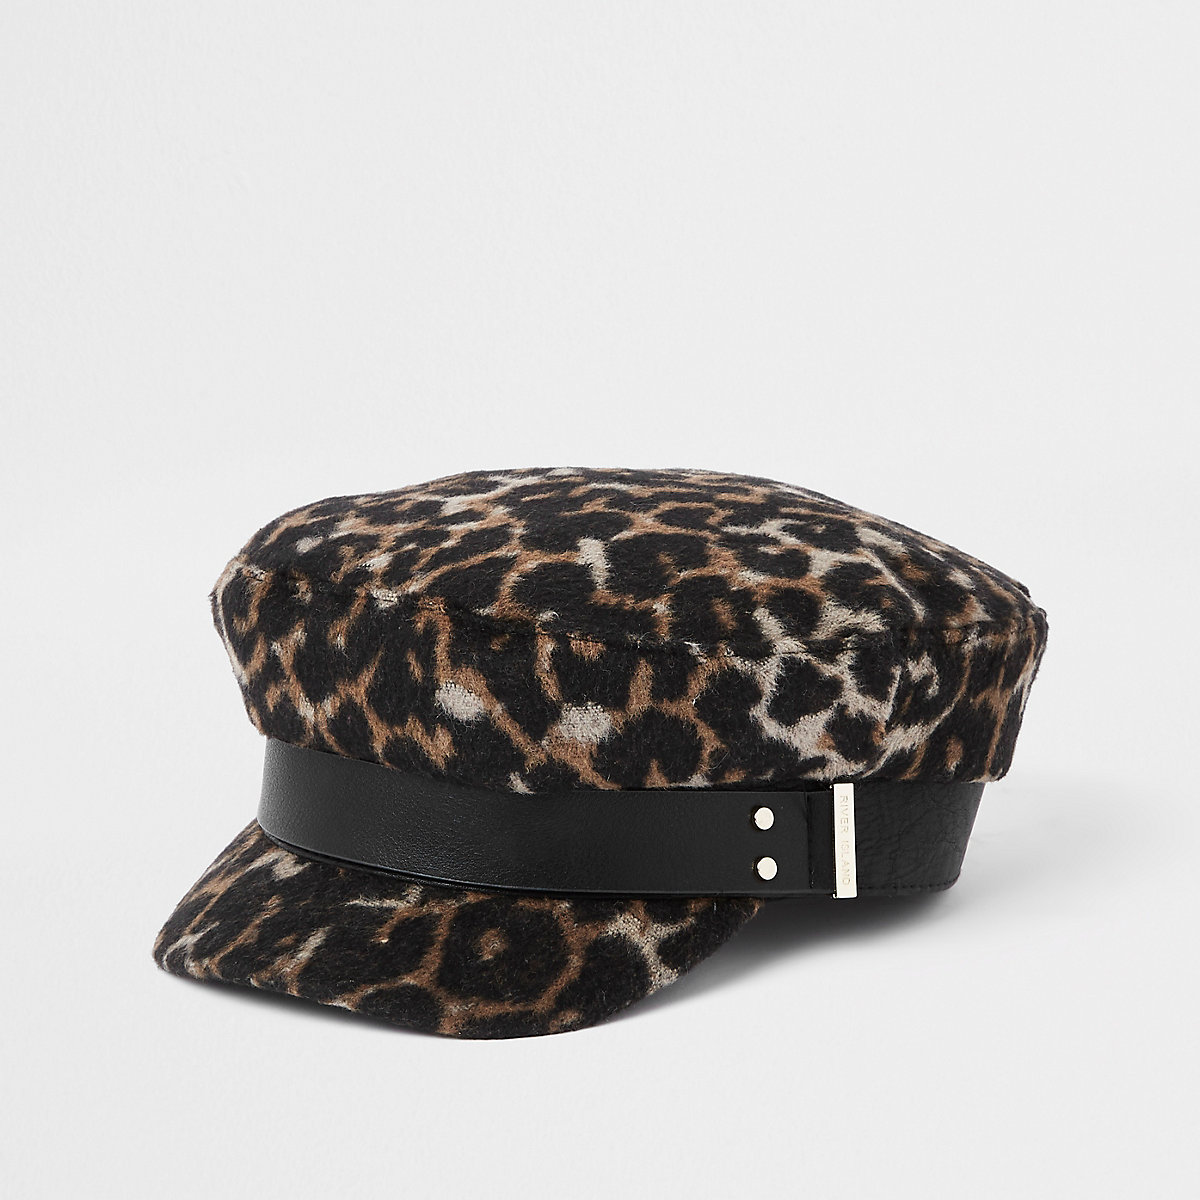 Casquette gavroche léopard marron cloutée